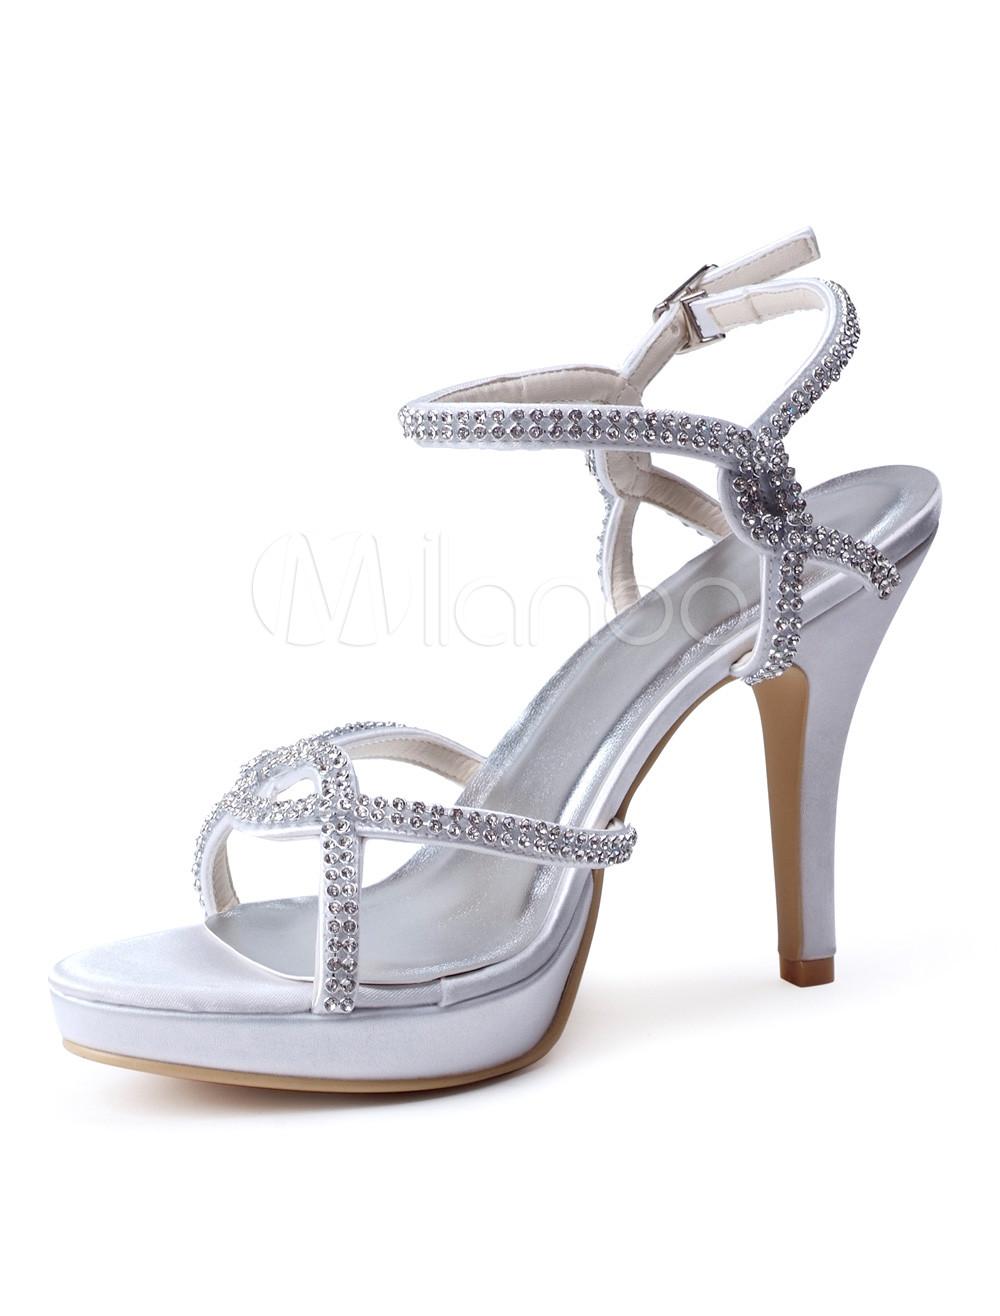 Buy Sexy Ecru White Rhinestone Stiletto Heel Silk And Satin Dress Sandals for $57.95 in Milanoo store